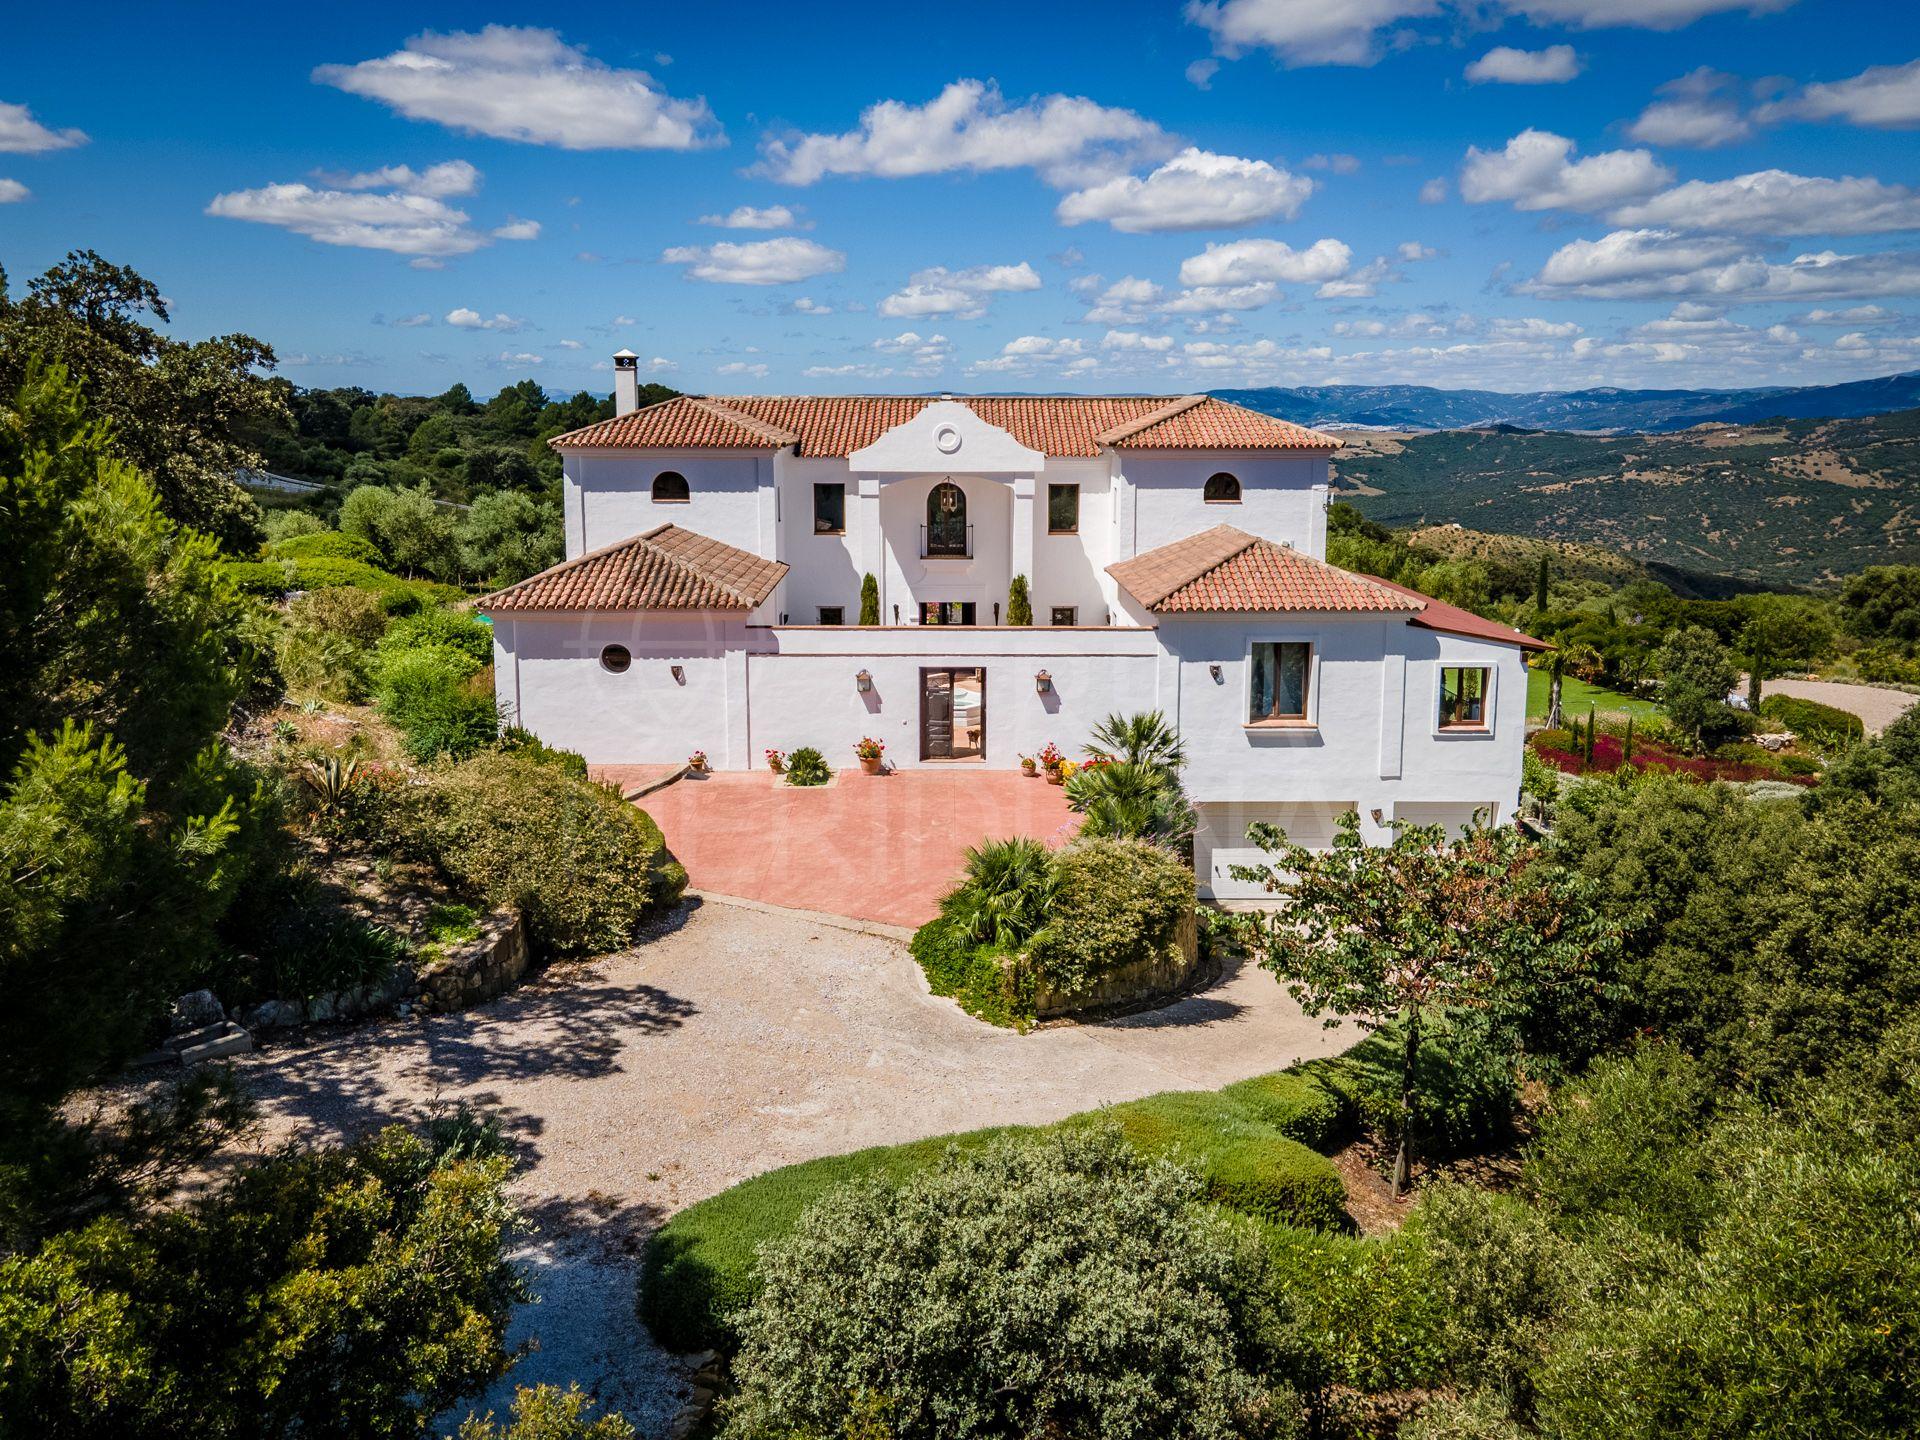 Superb 6 Bedroom Upgraded Spanish Style Villa On Huge Plot For Sale In Gaucin